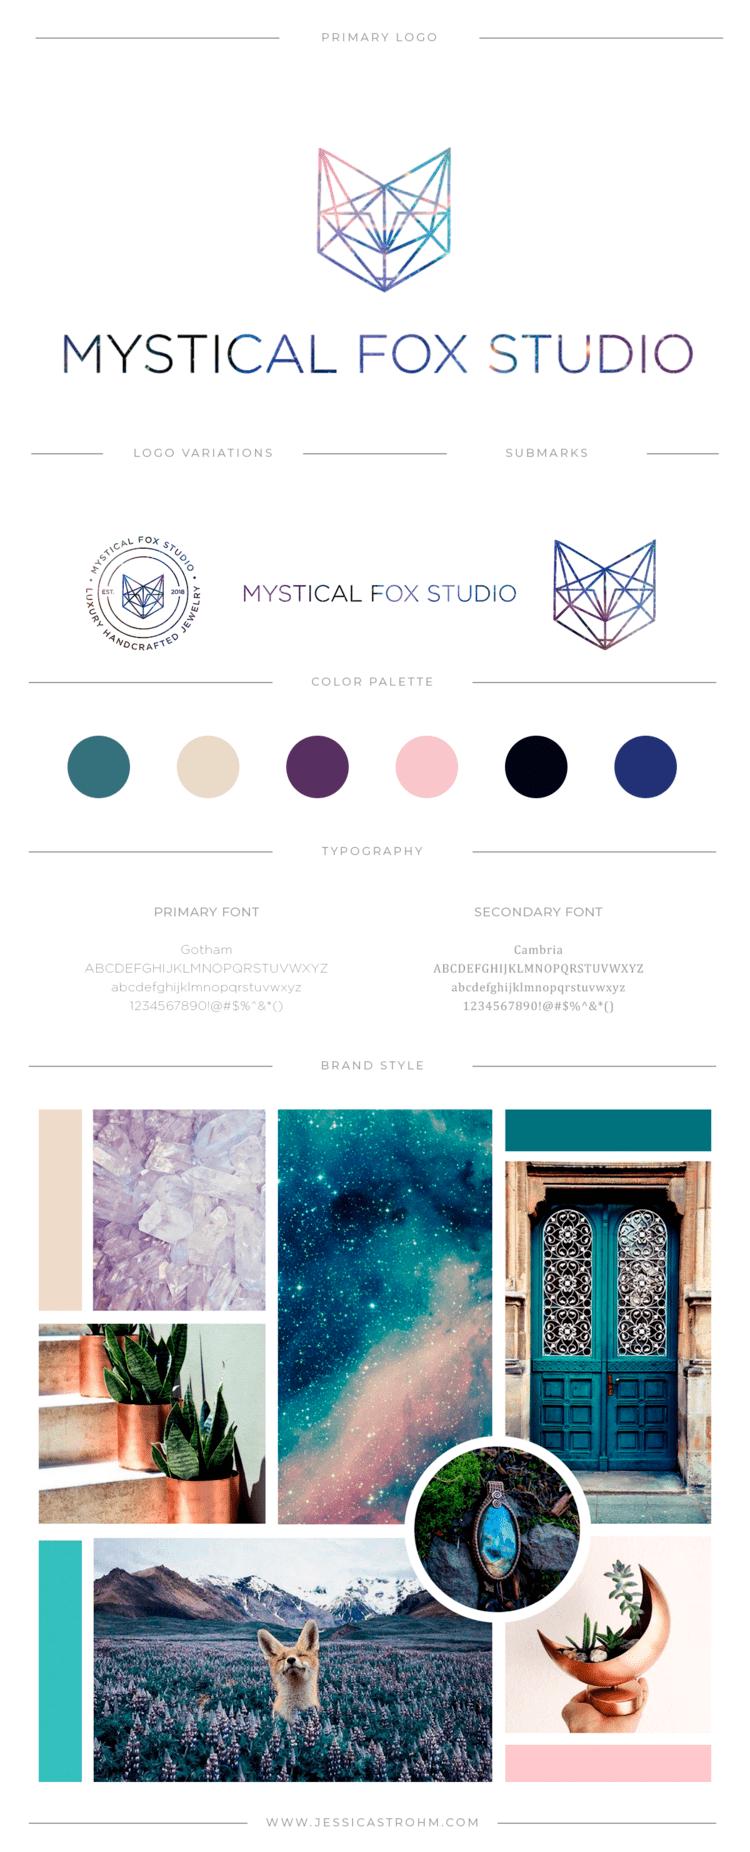 mystical-fox-studio-brand-board-min.png